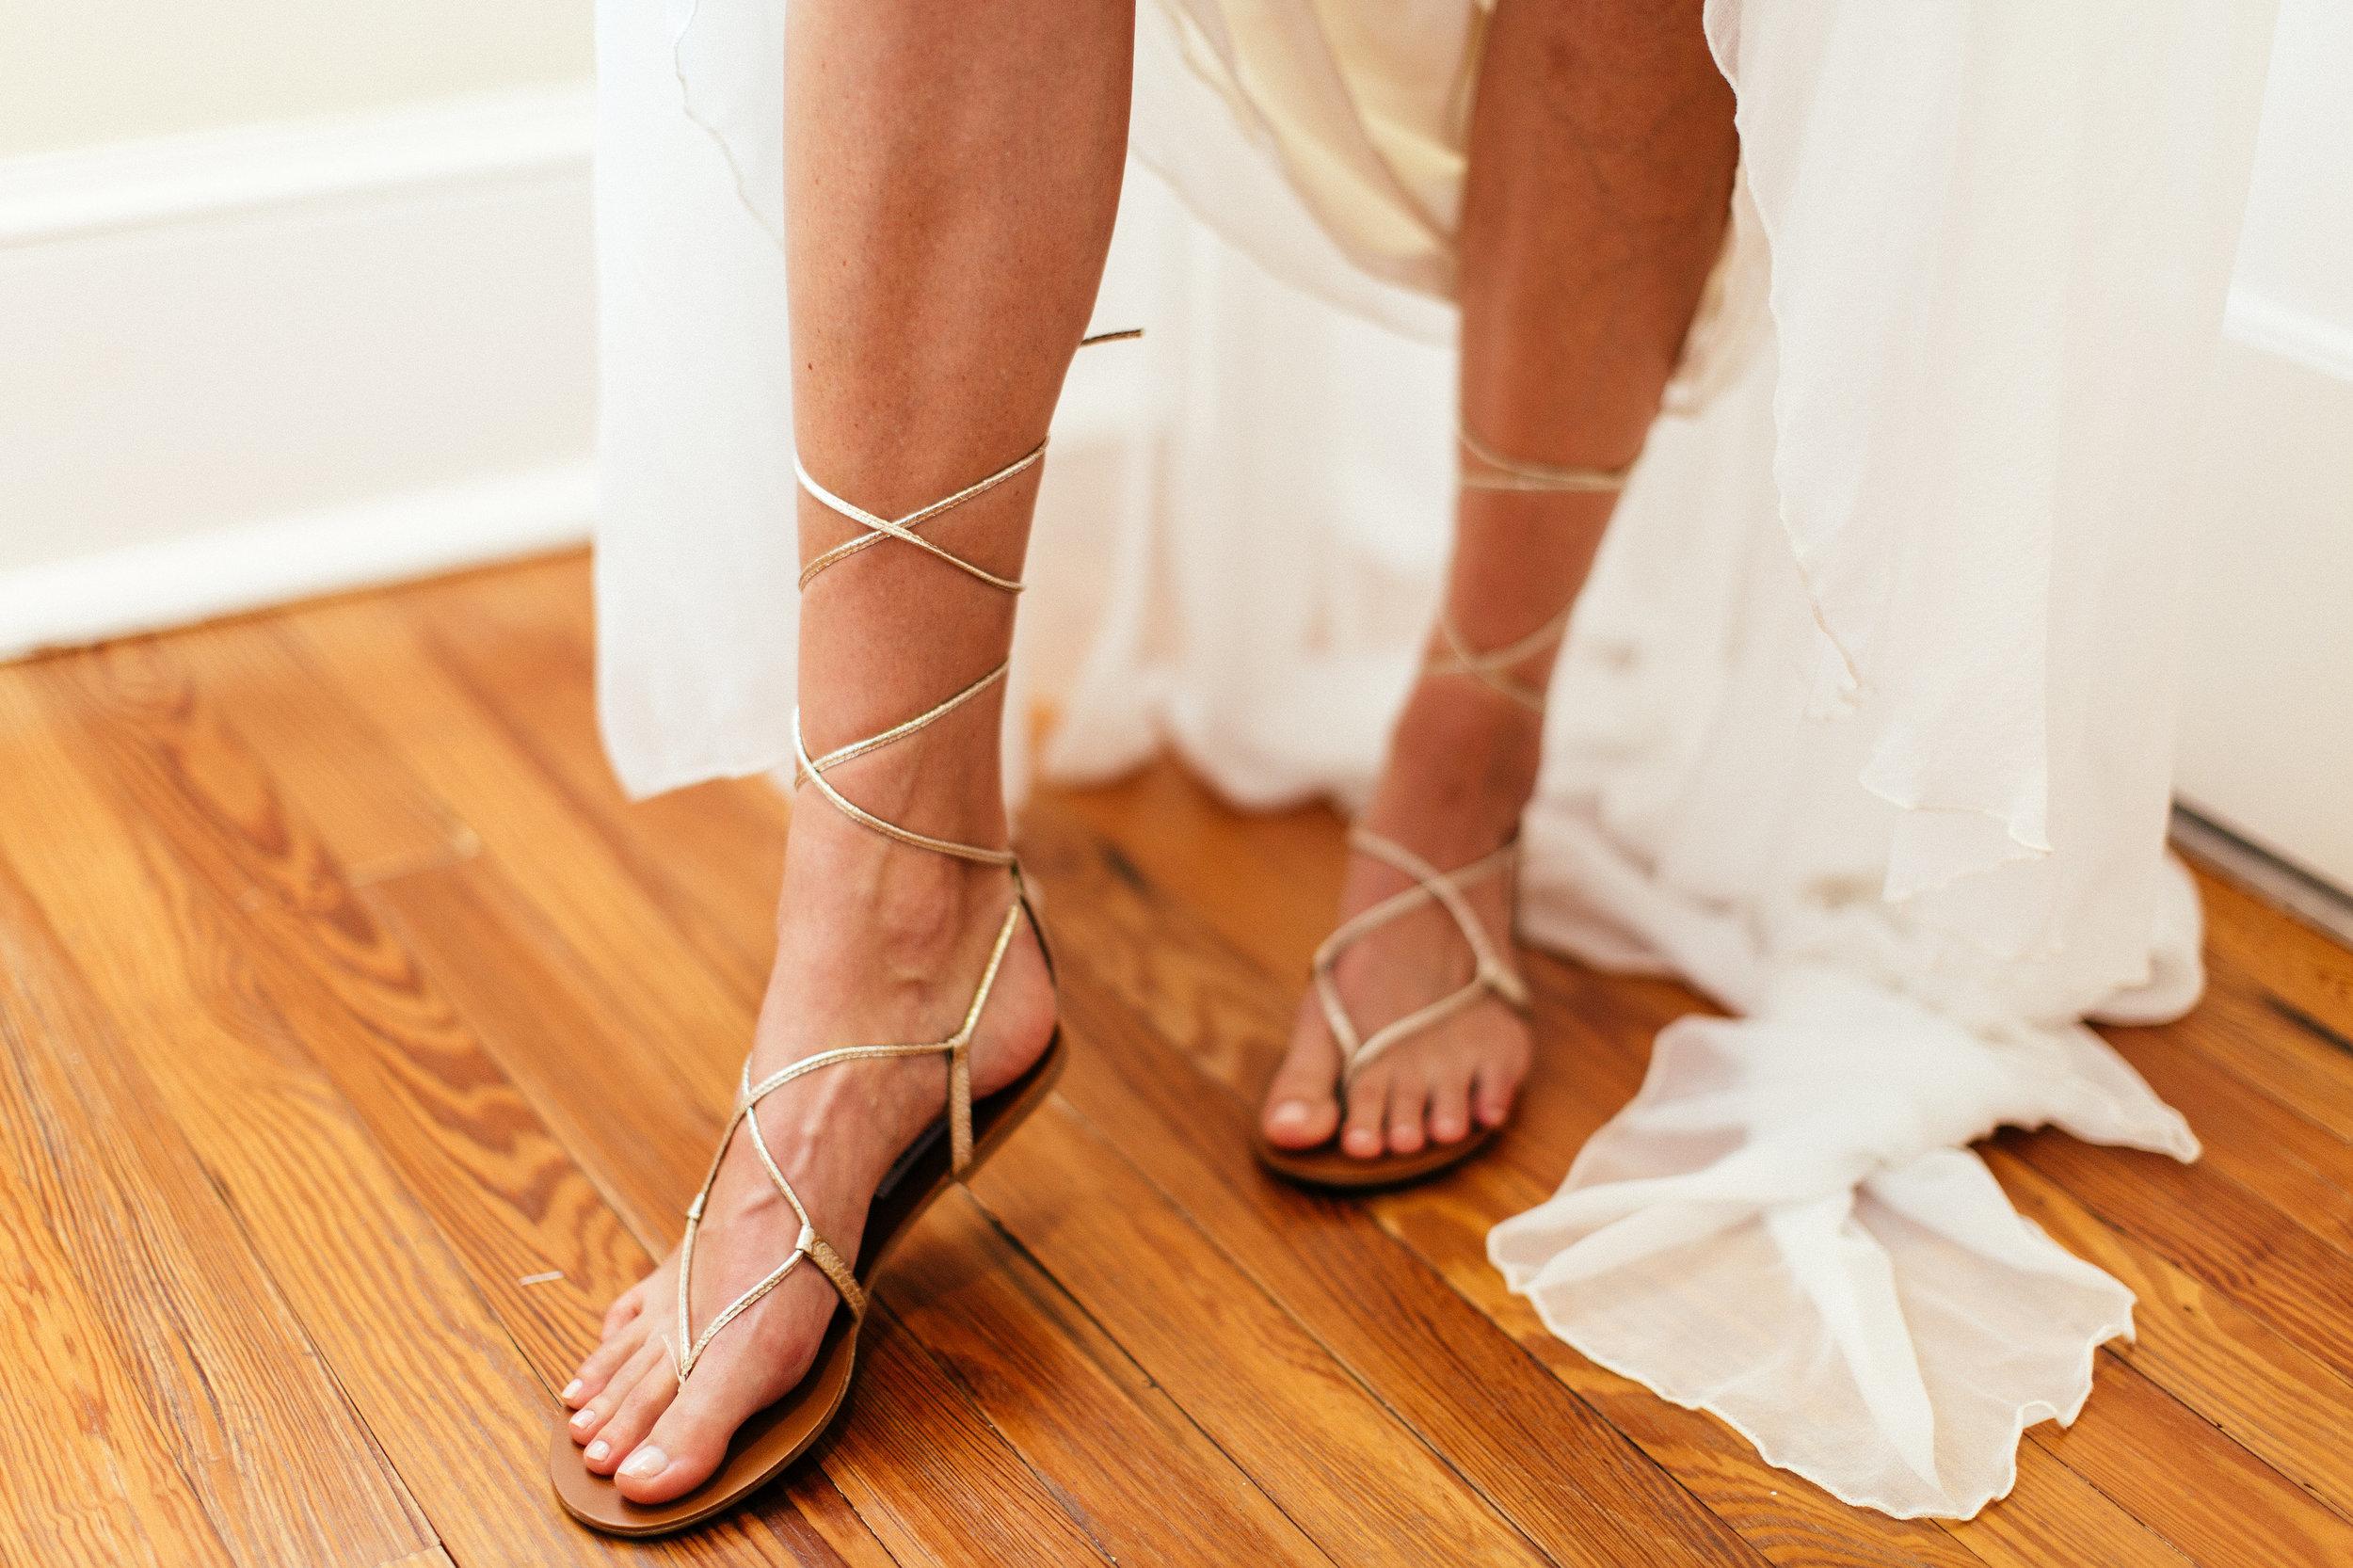 christina-karst-photography-ivory-and-beau-bridal-boutique-sarah-seven-lafayette-boho-bride-boho-bridal-boutique-indie-bridal-boutique-savannah-bridal-boutique-savannah-wedding-dresses-savannah-bridal-gowns-6.jpg